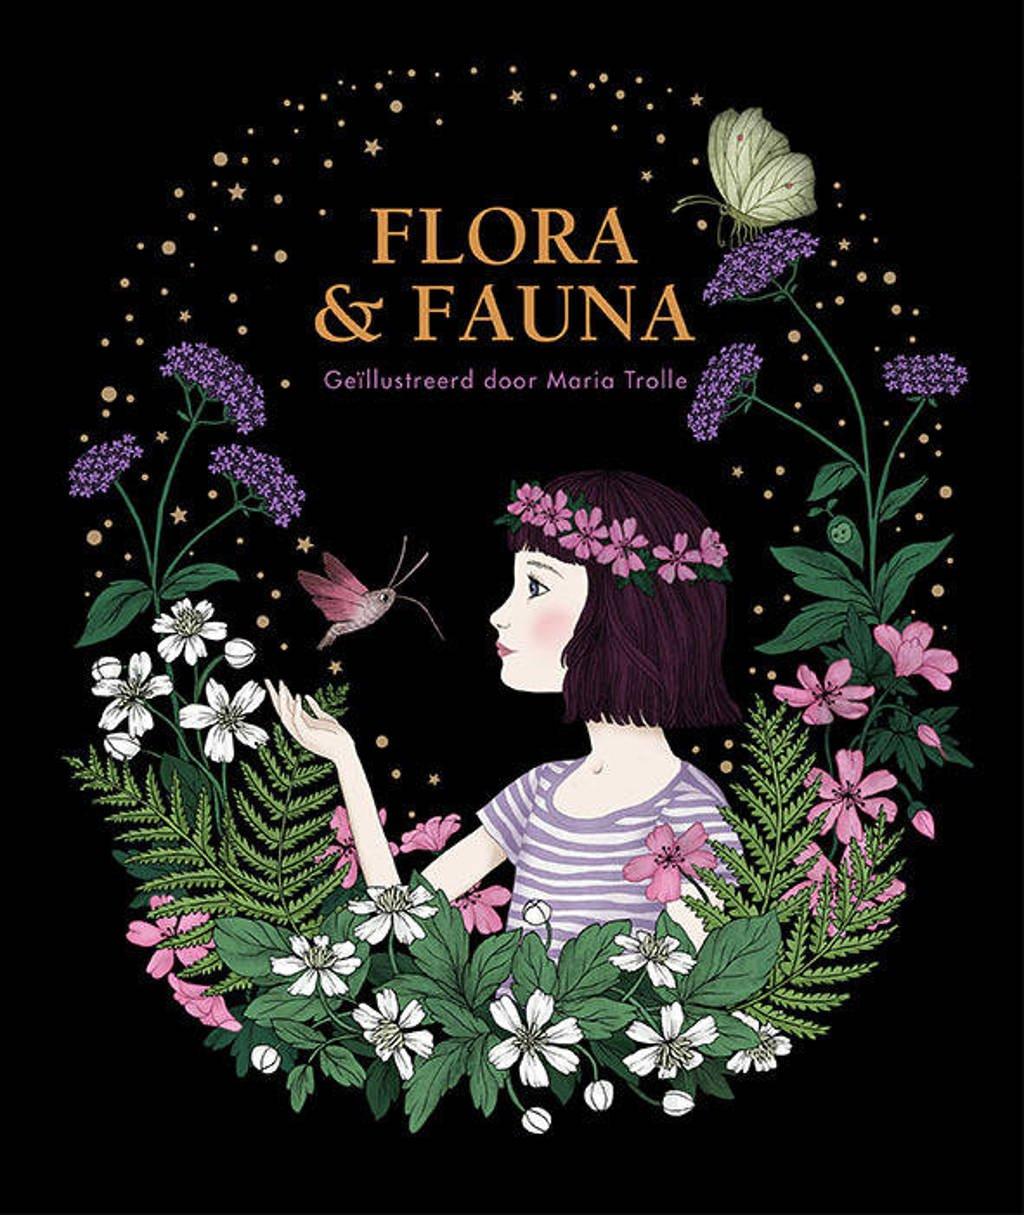 Flora & Fauna - Maria Trolle